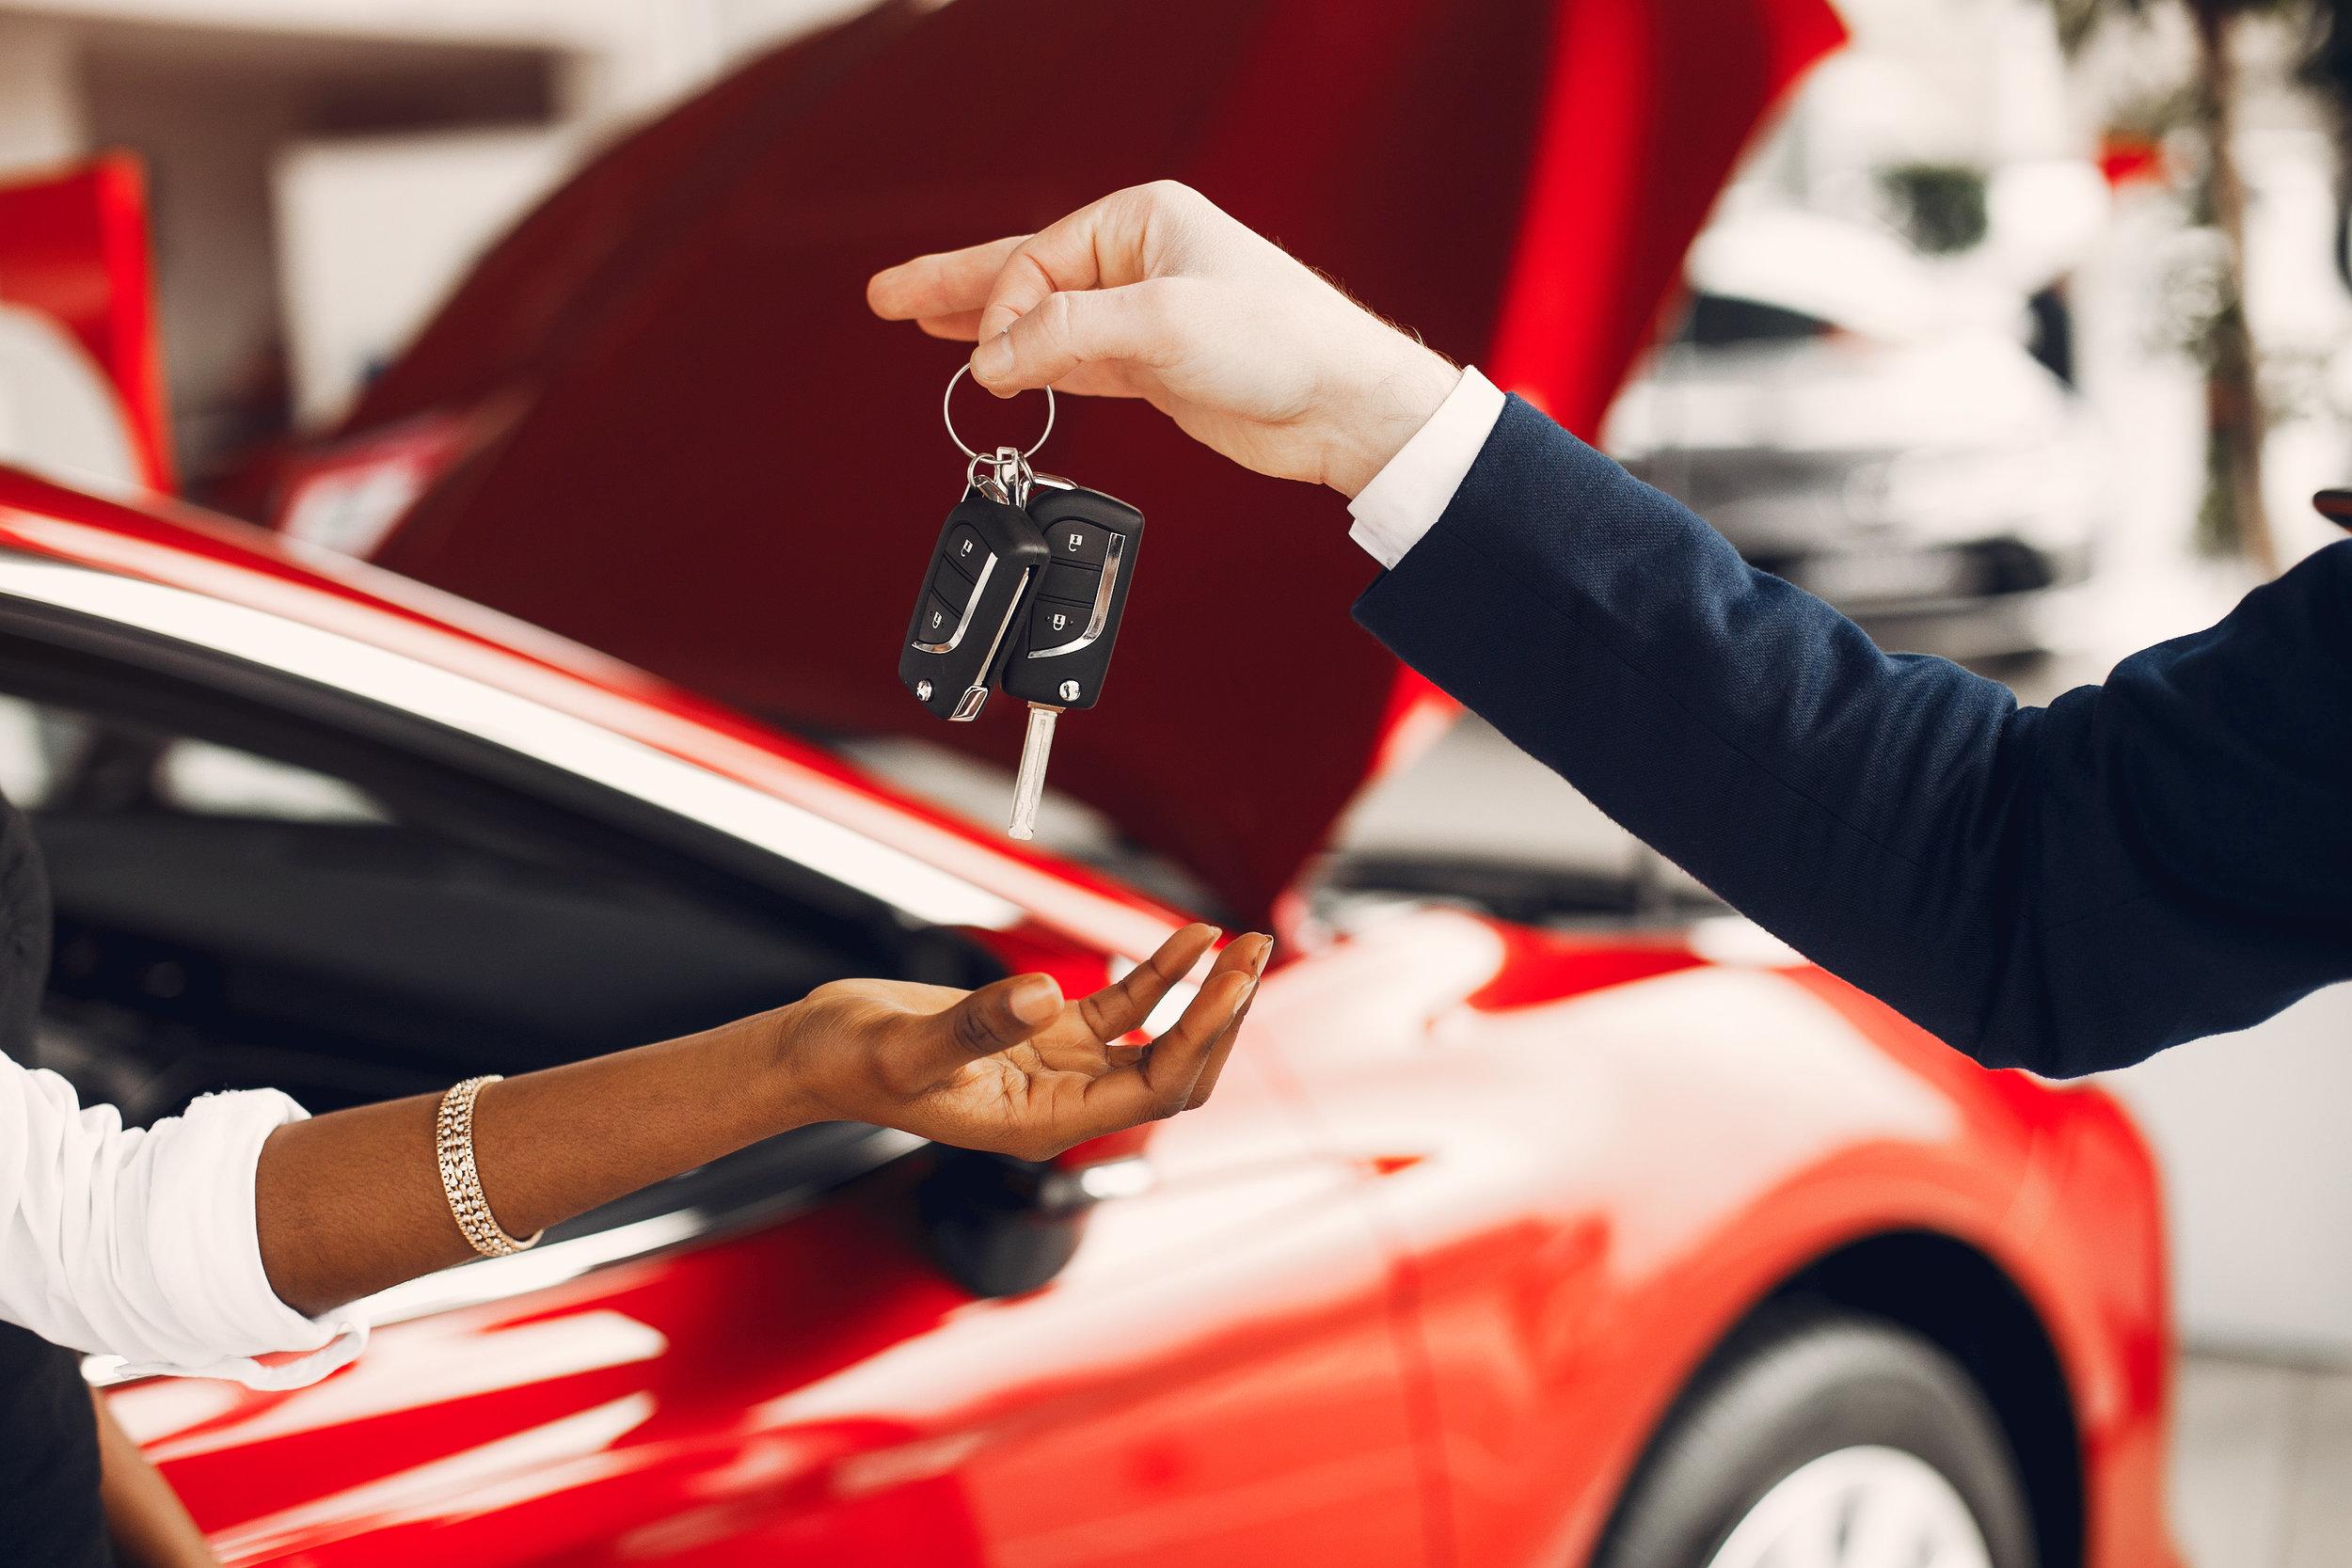 stylish-black-woman-in-a-car-salon-JWUSHD4.jpg